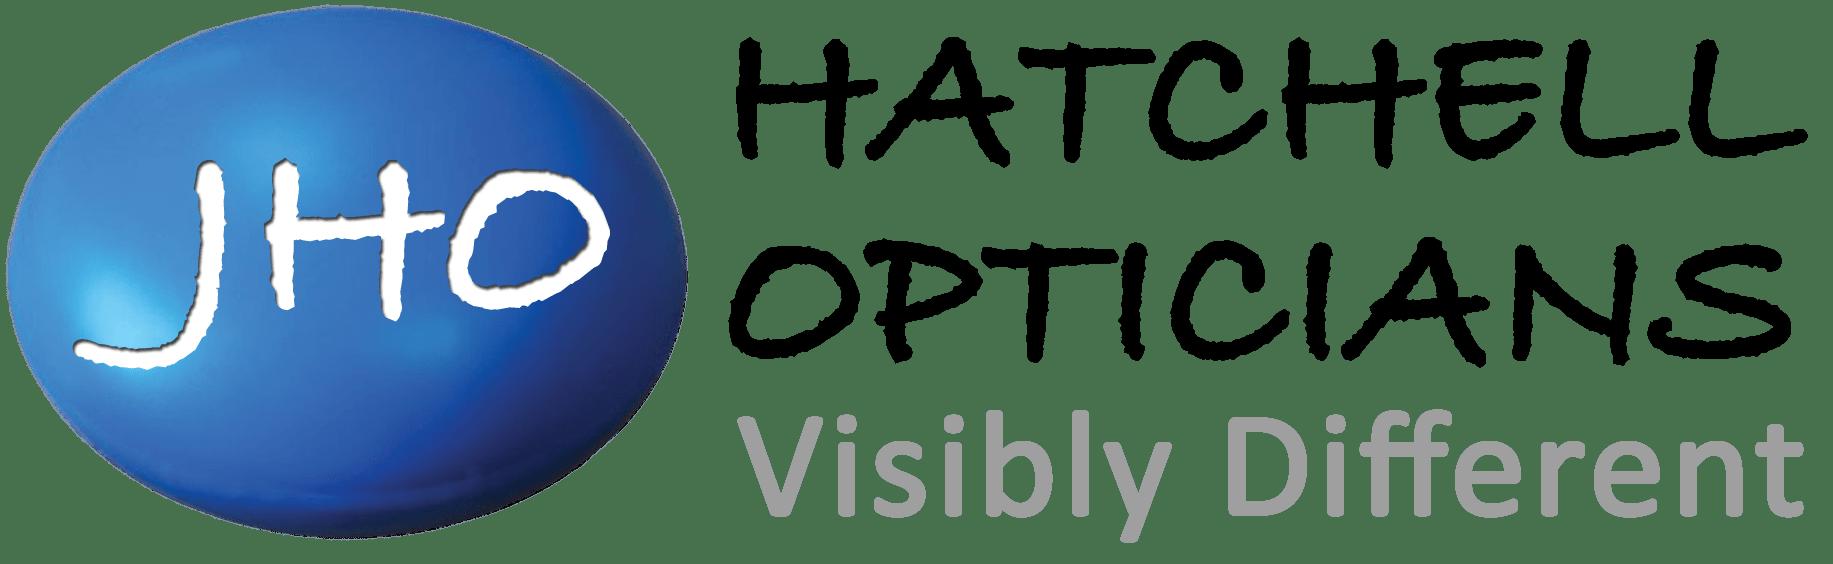 Hatchell Opticians